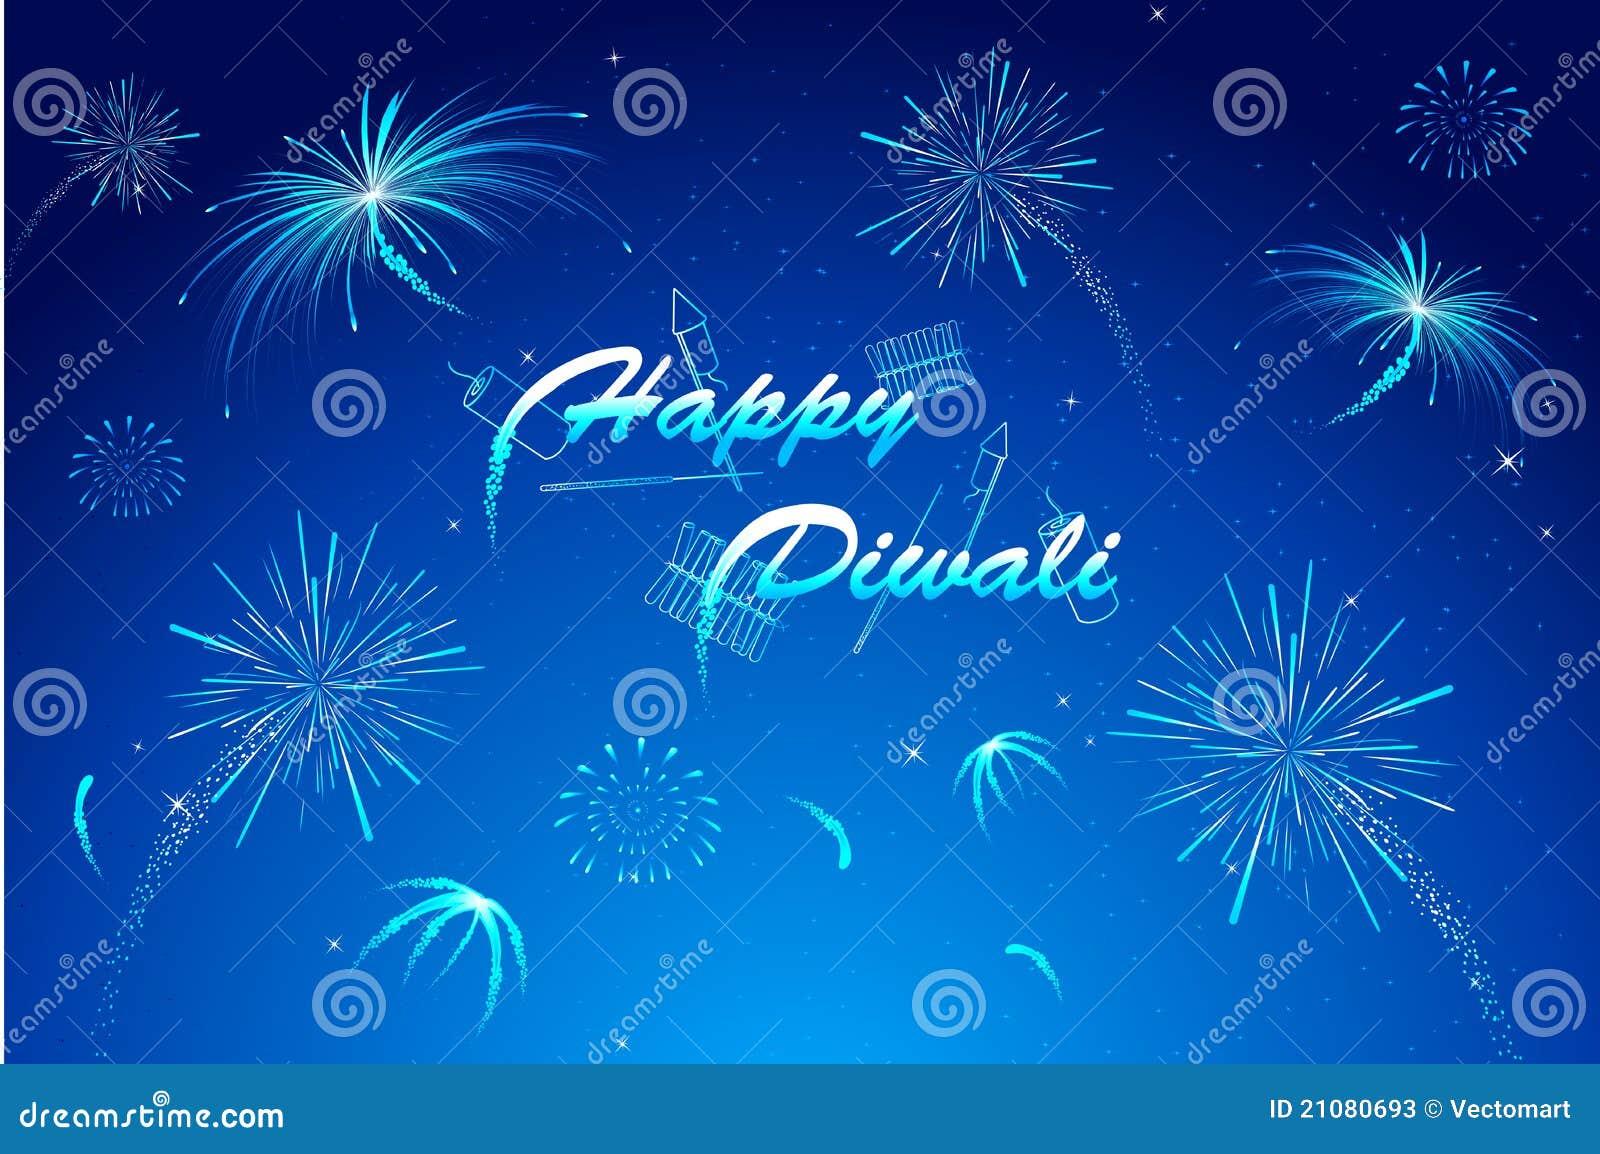 diwali wish stock photos   image 21080693